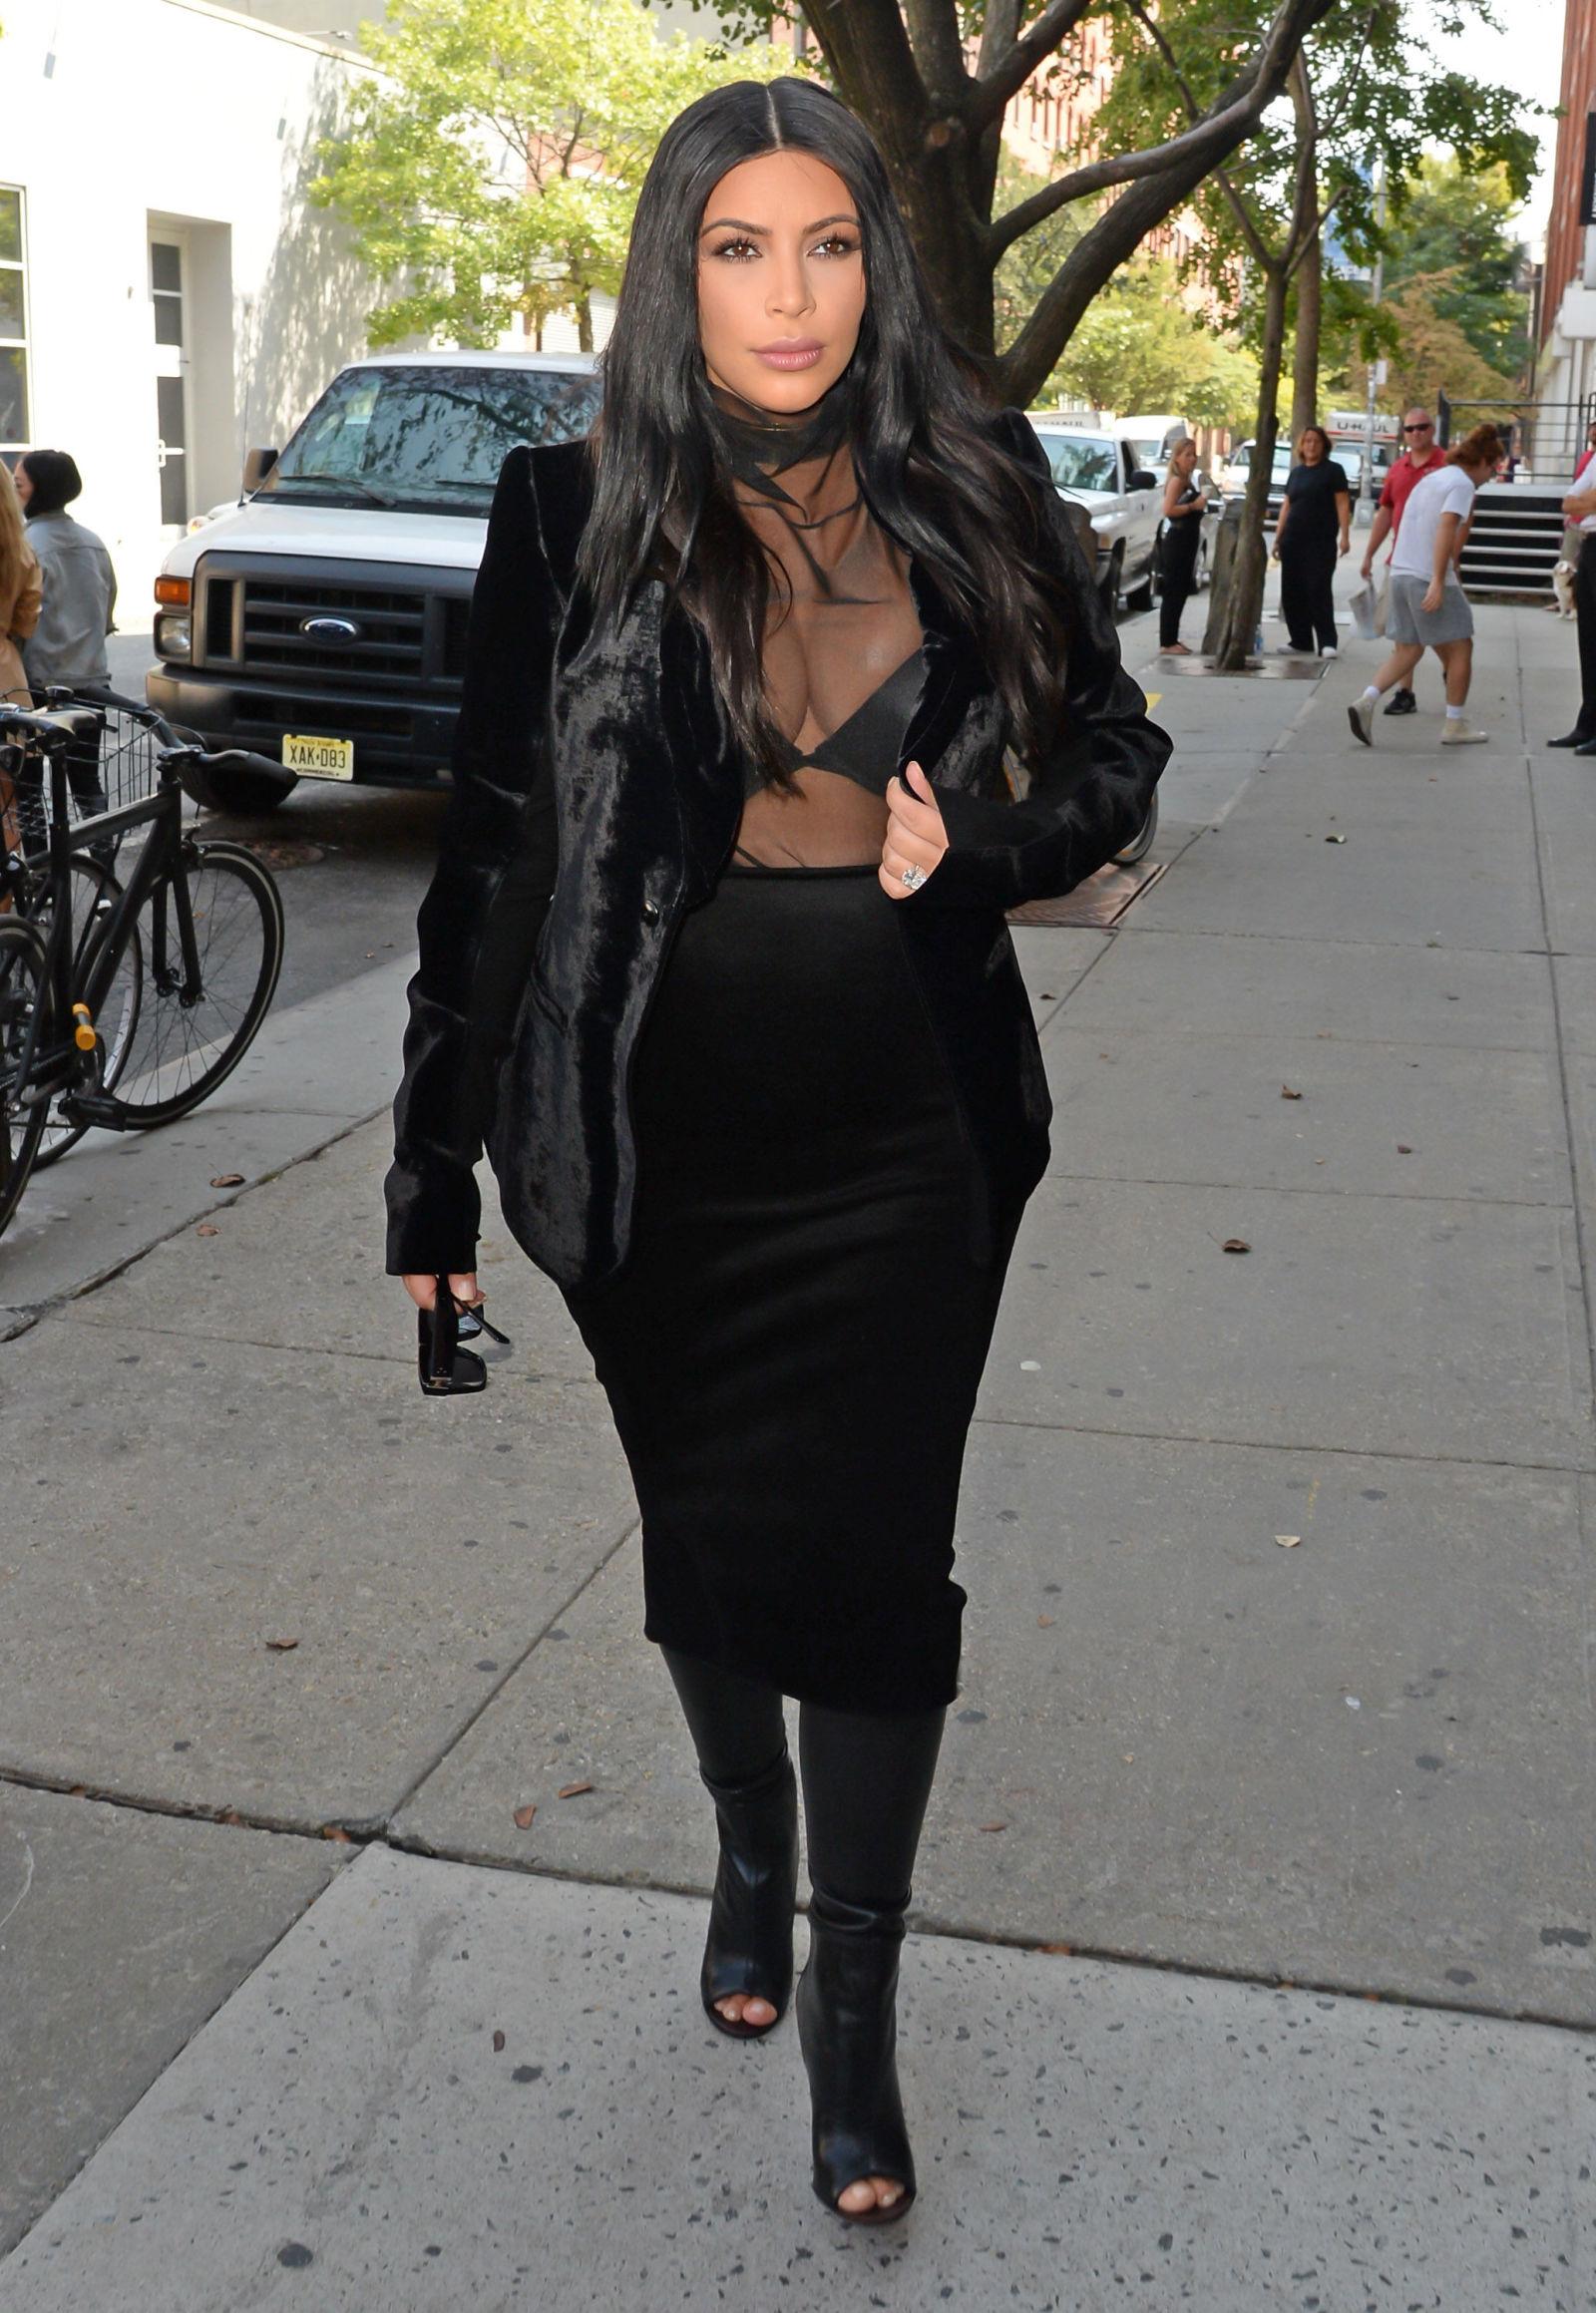 Kim Kardashian 2015 Fashion Here 39 S What Kim Kardashian 39 S 2015 Makeover Looks Like So Far